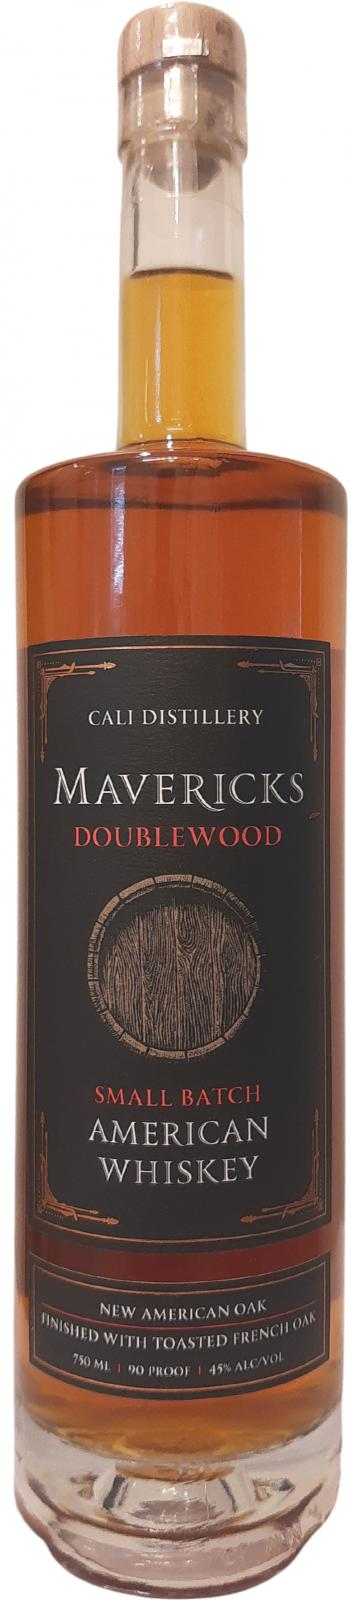 Mavericks Doublewood